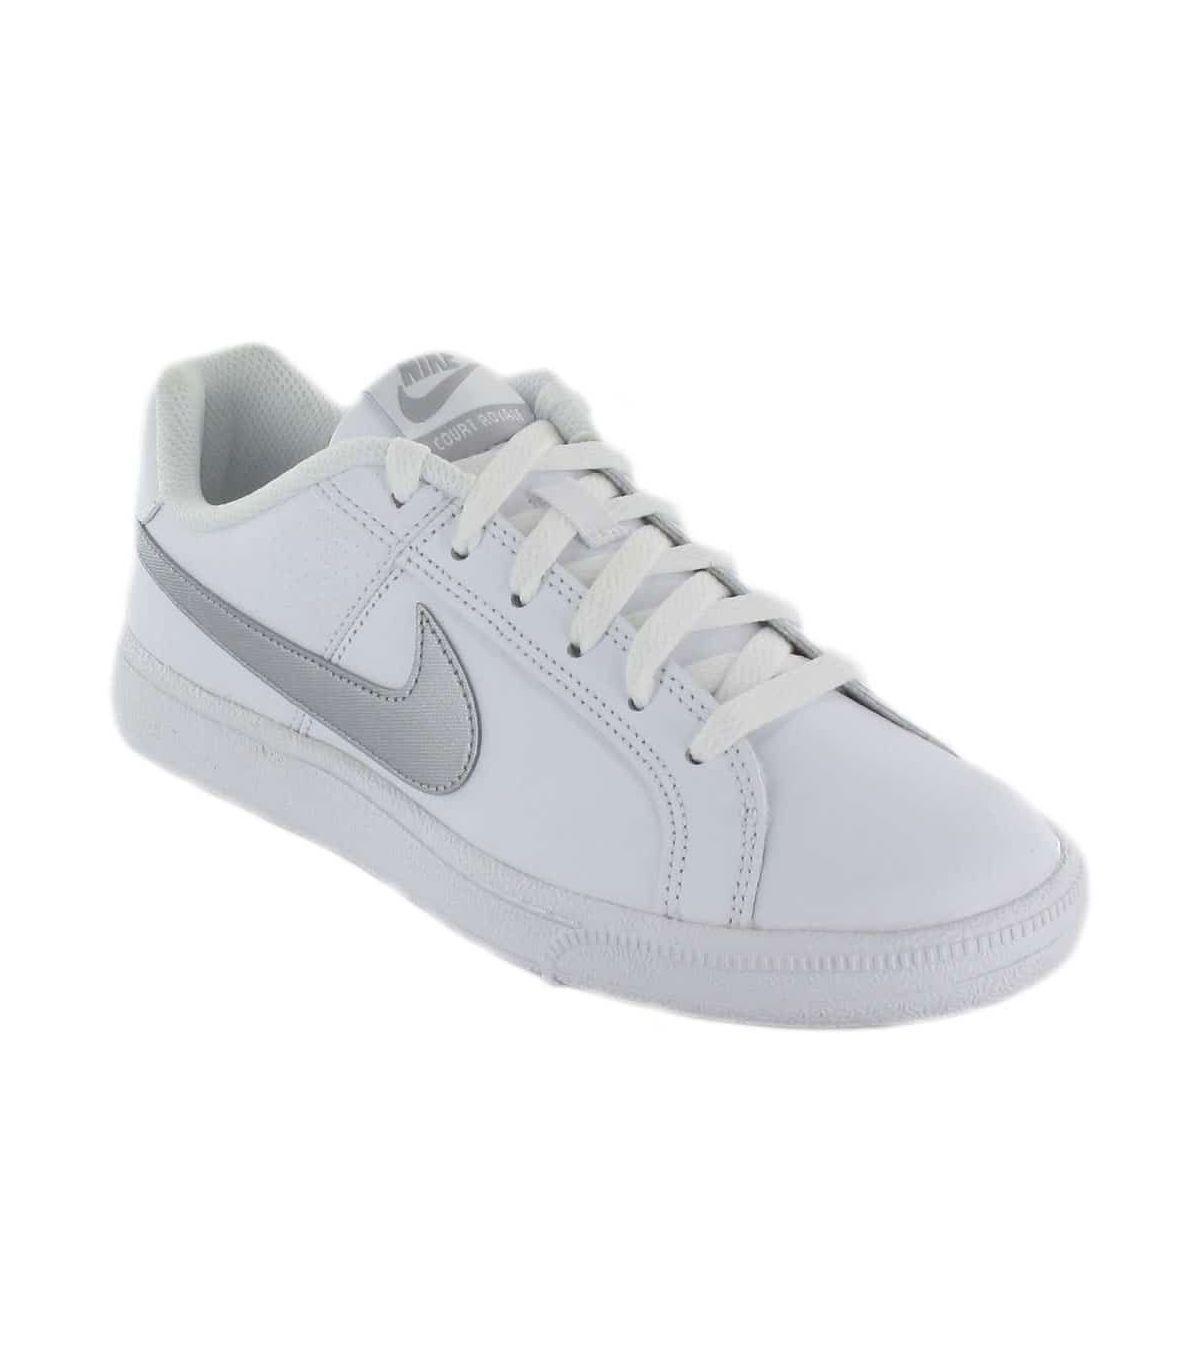 Nike Court Royale W 100 Nike Calzado Casual Mujer Lifestyle Tallas: 37,5, 38, 39, 40, 41; Color: blanco